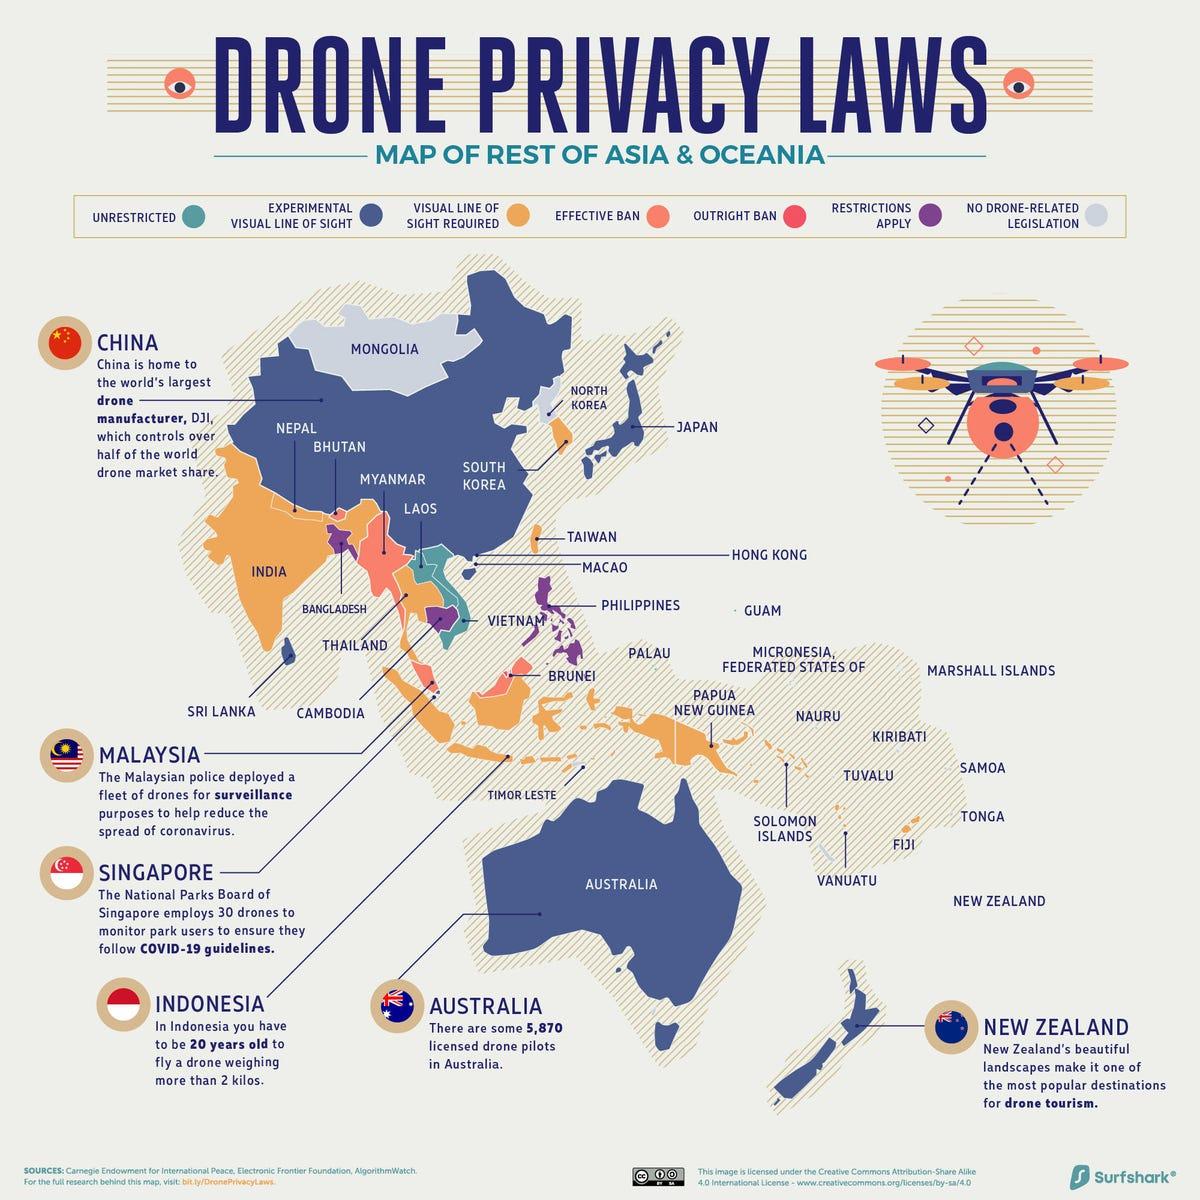 drone-privacy-laws-around-eastasia-oceania.jpg